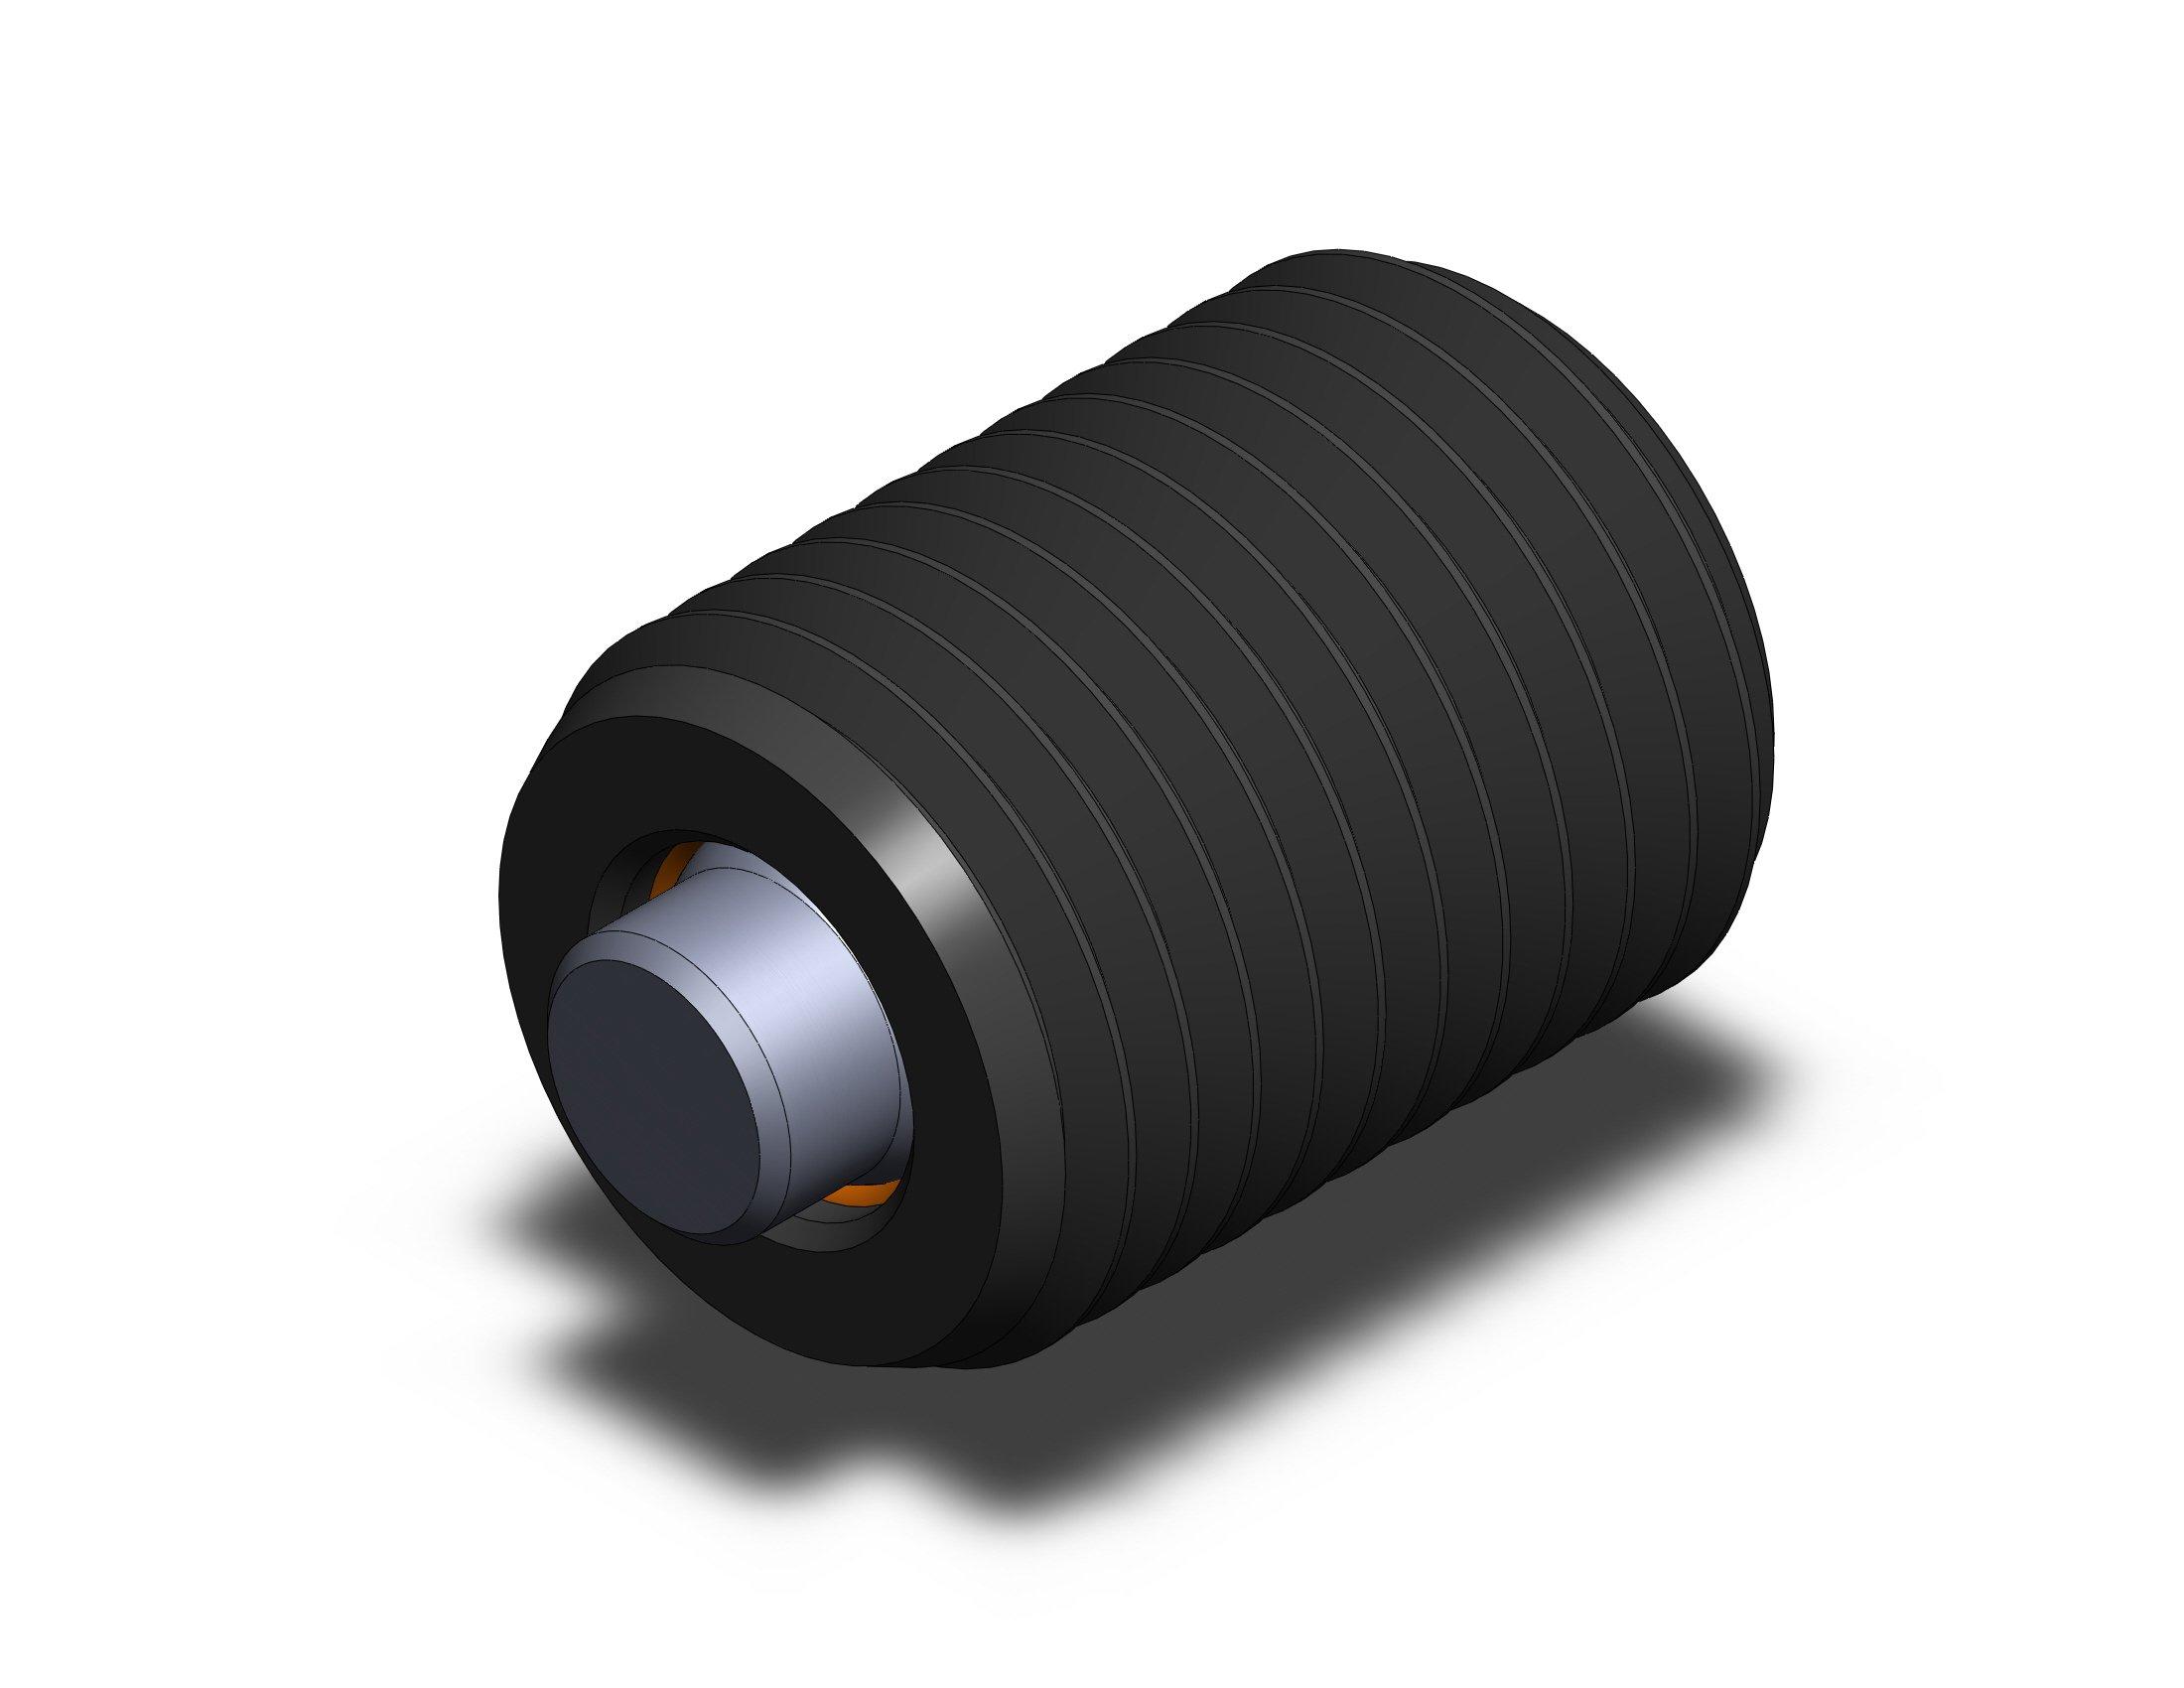 Fairlane TBU-1108X2-D Threaded Design Swivot – 1-8 X 2 – Delrin